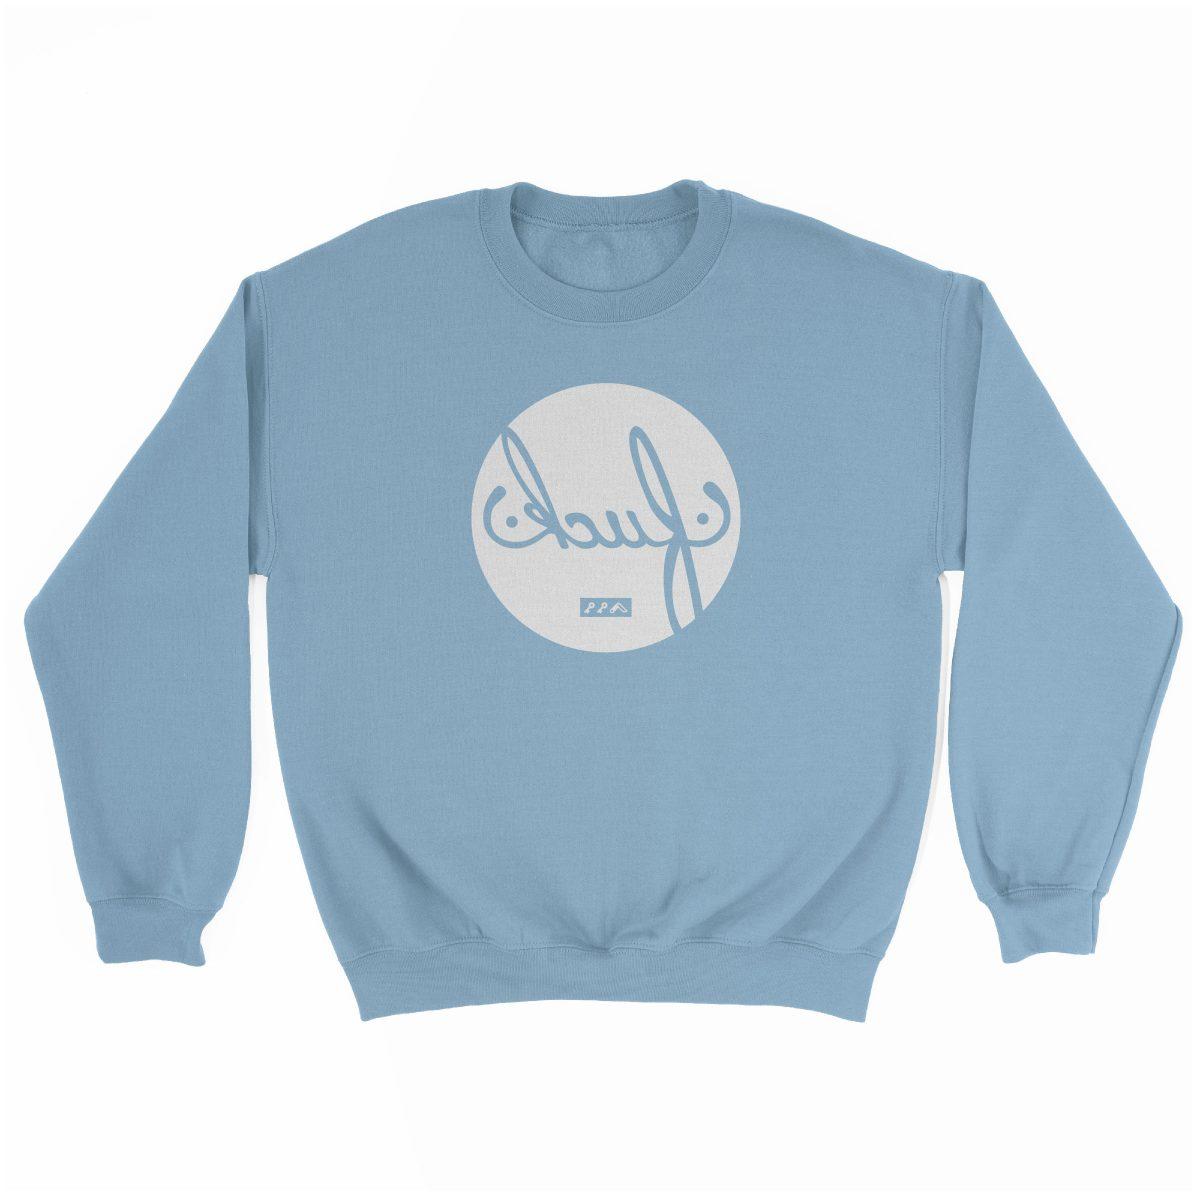 i give zero fucks sweatshirt light blue at kikicutt.com